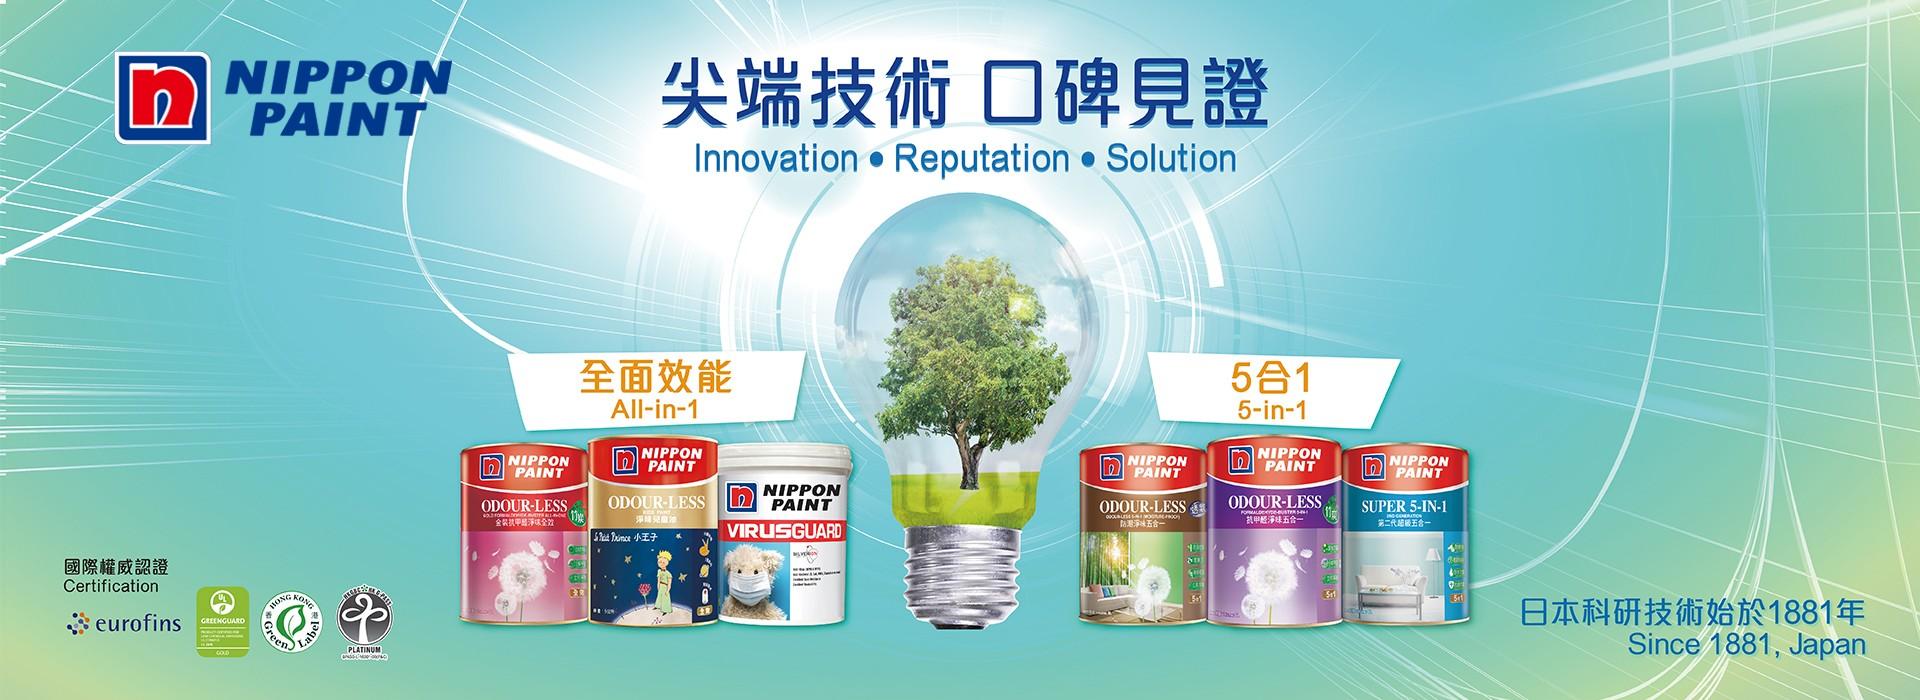 兆記行website banner (branding)